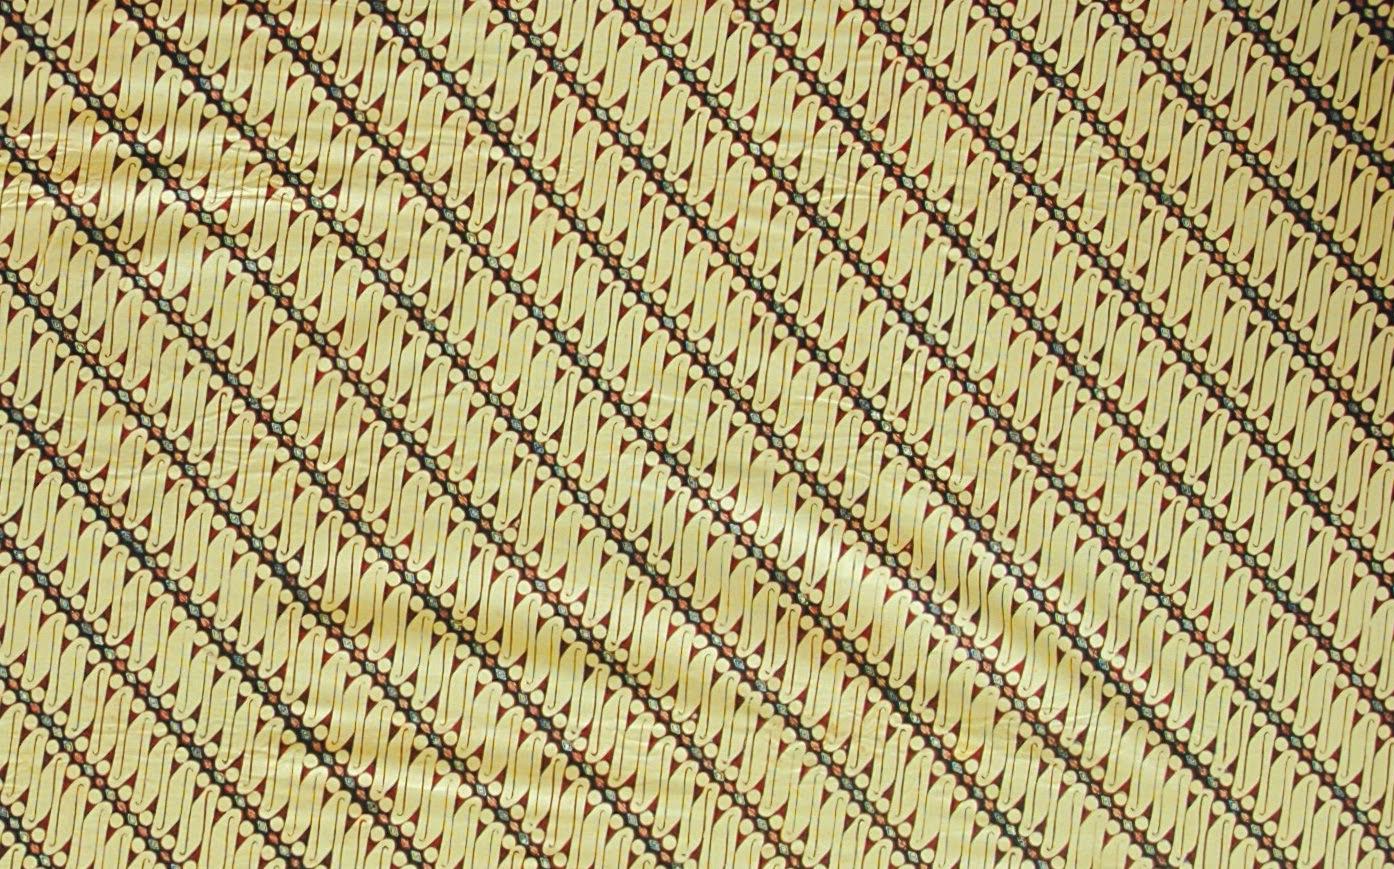 Macam Macam Motif Batik di Indonesia - Contoh Batik Garut